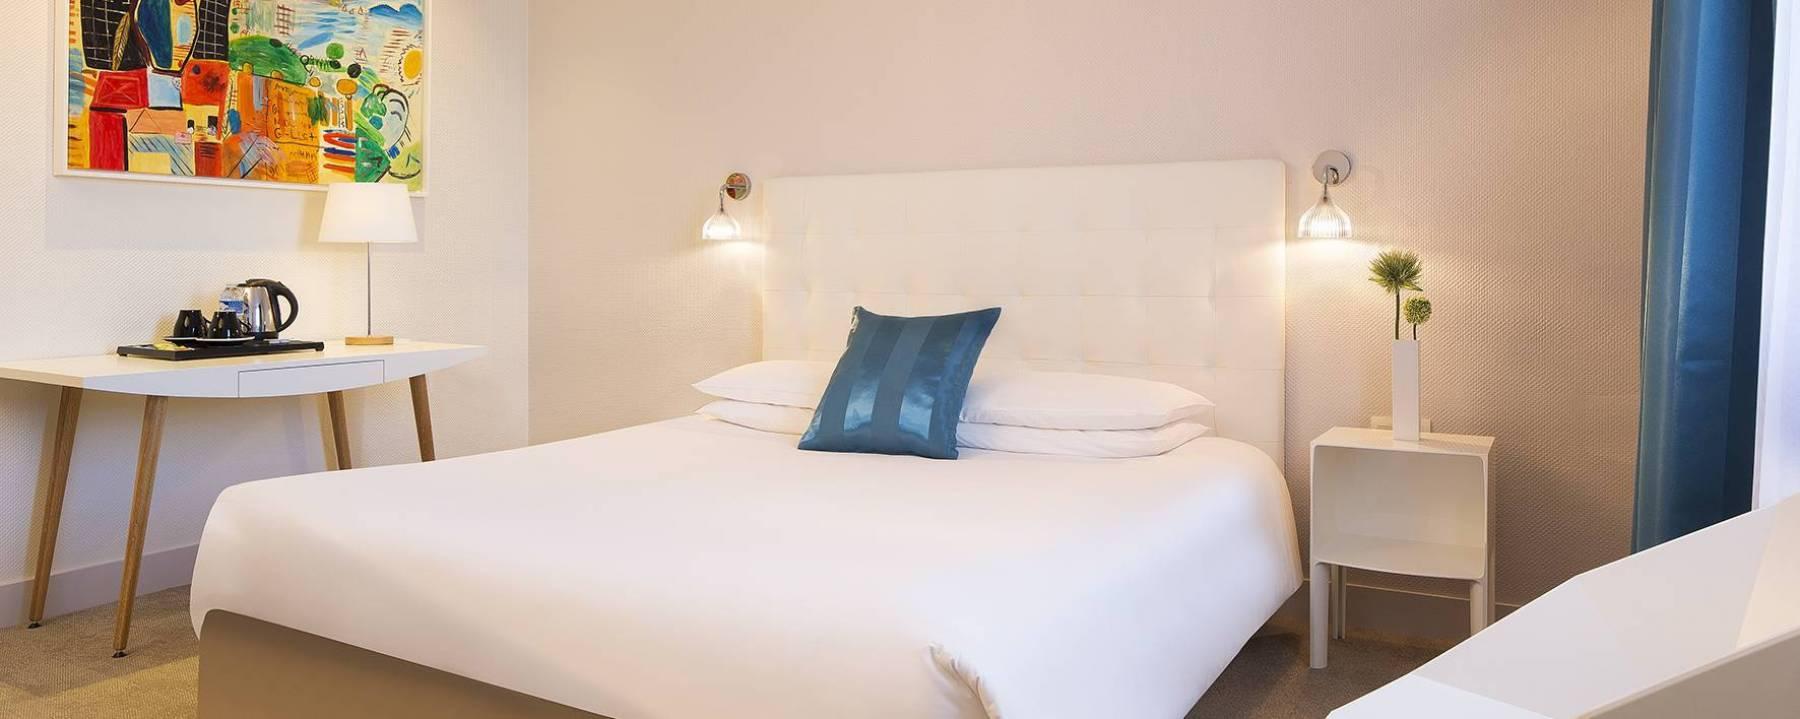 Chambre - Hotel Escale Oceania Lorient 3 etoiles (3).jpg